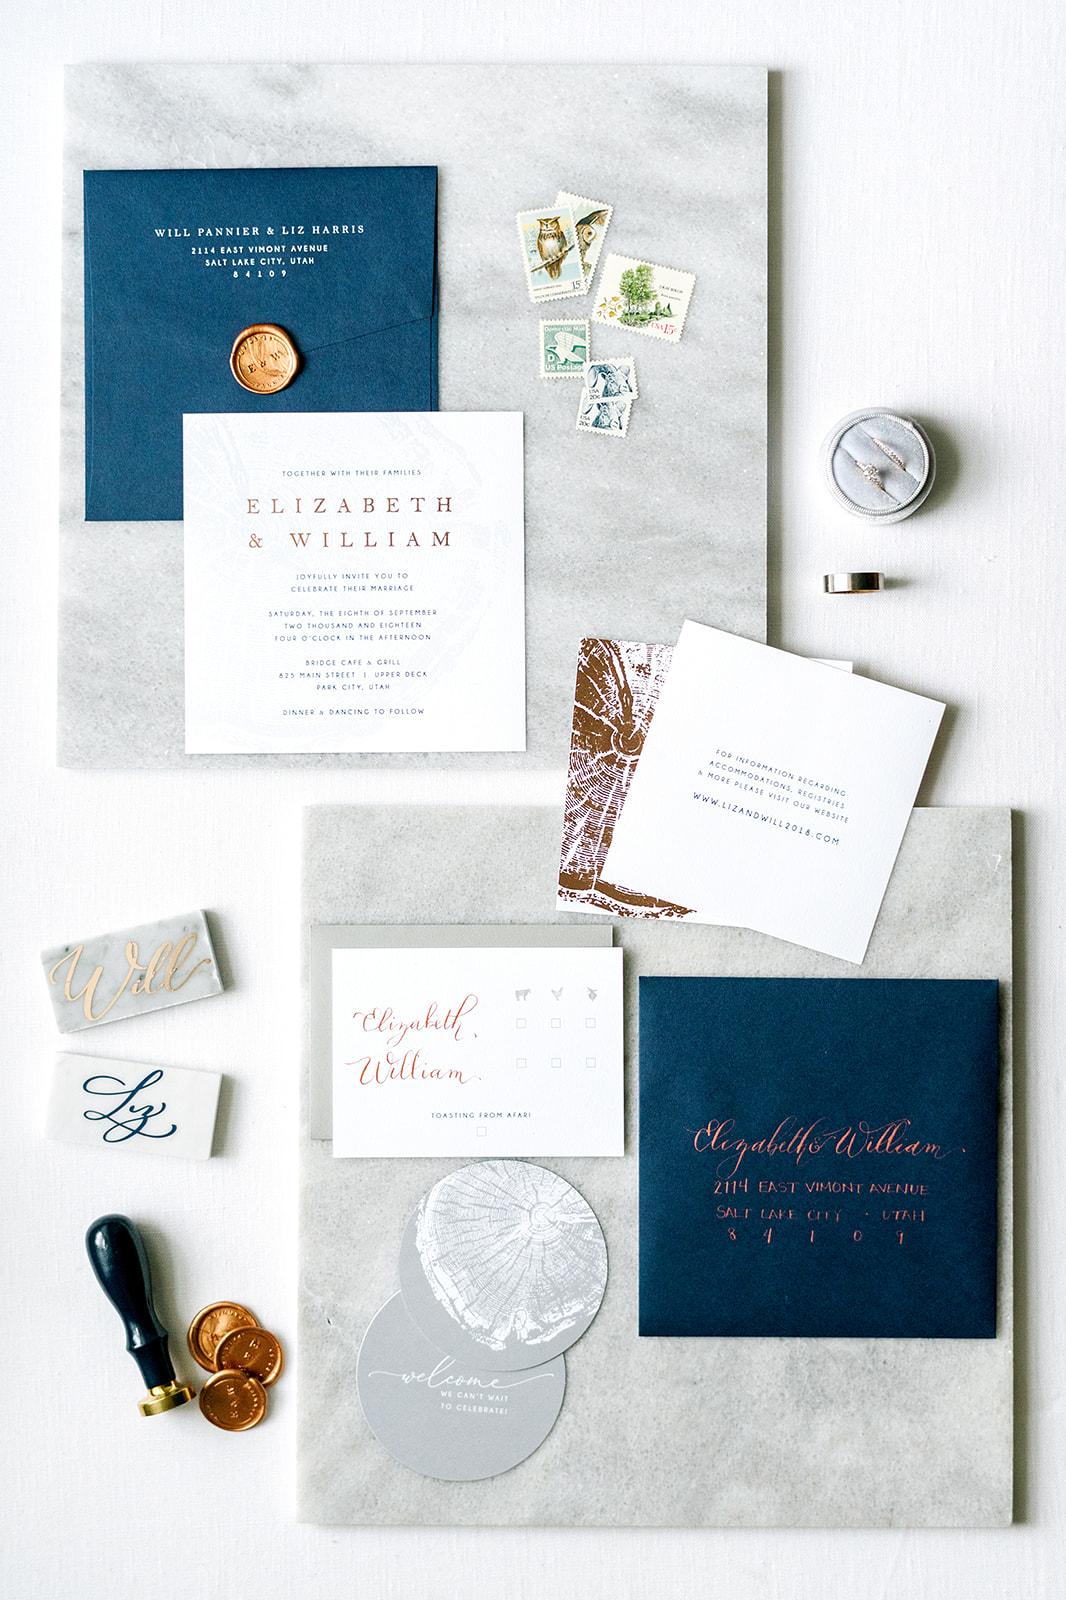 Park City Main Street Wedding | Modern Wedding Design | Navy Wedding Details | Outdoor Wedding | Michelle Leo Events | Utah Event Planner | Heather Nan Photography